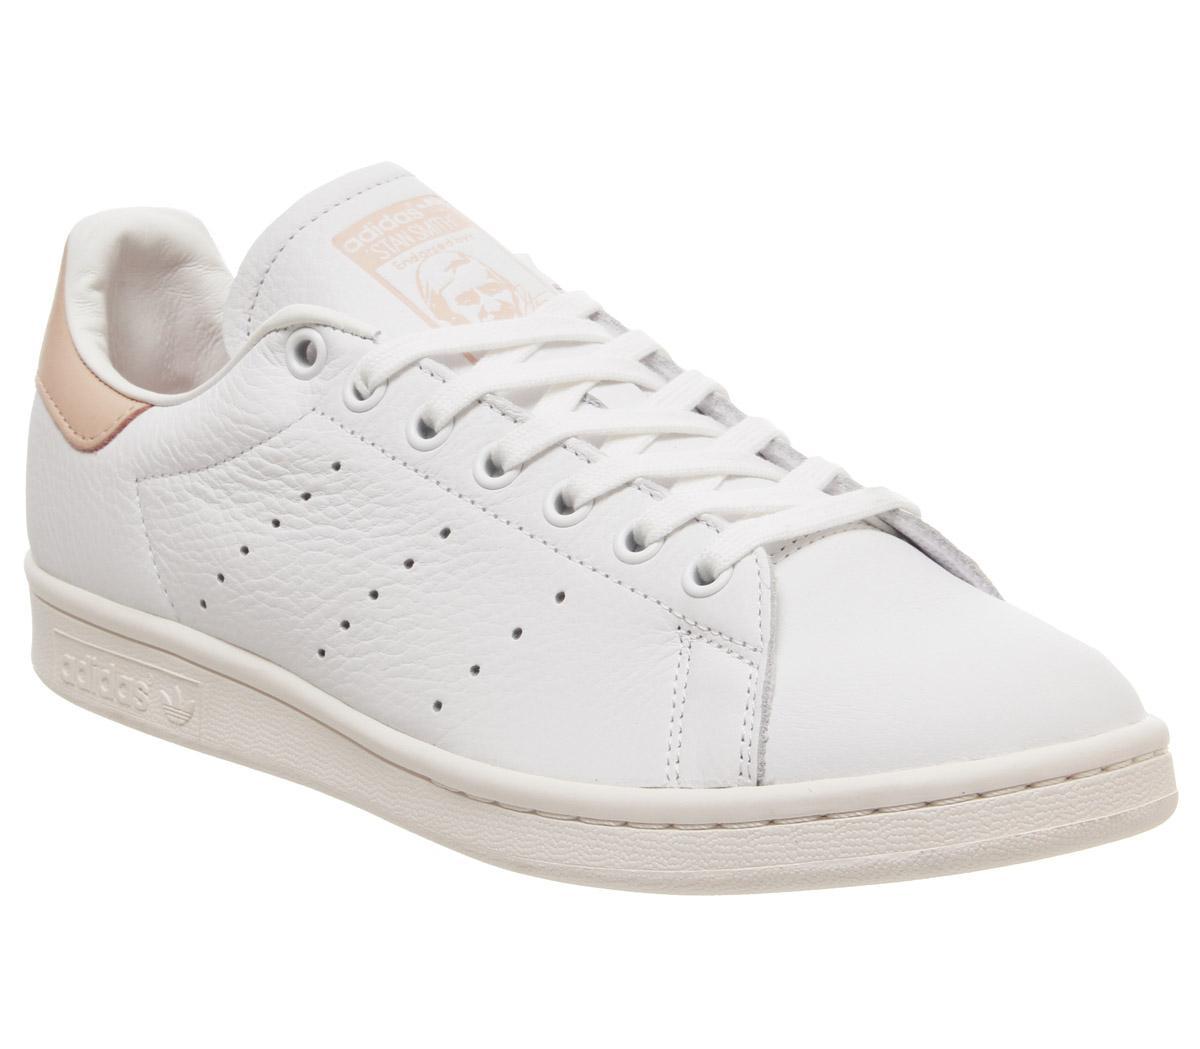 adidas Stan Smith Trainers White Vapour